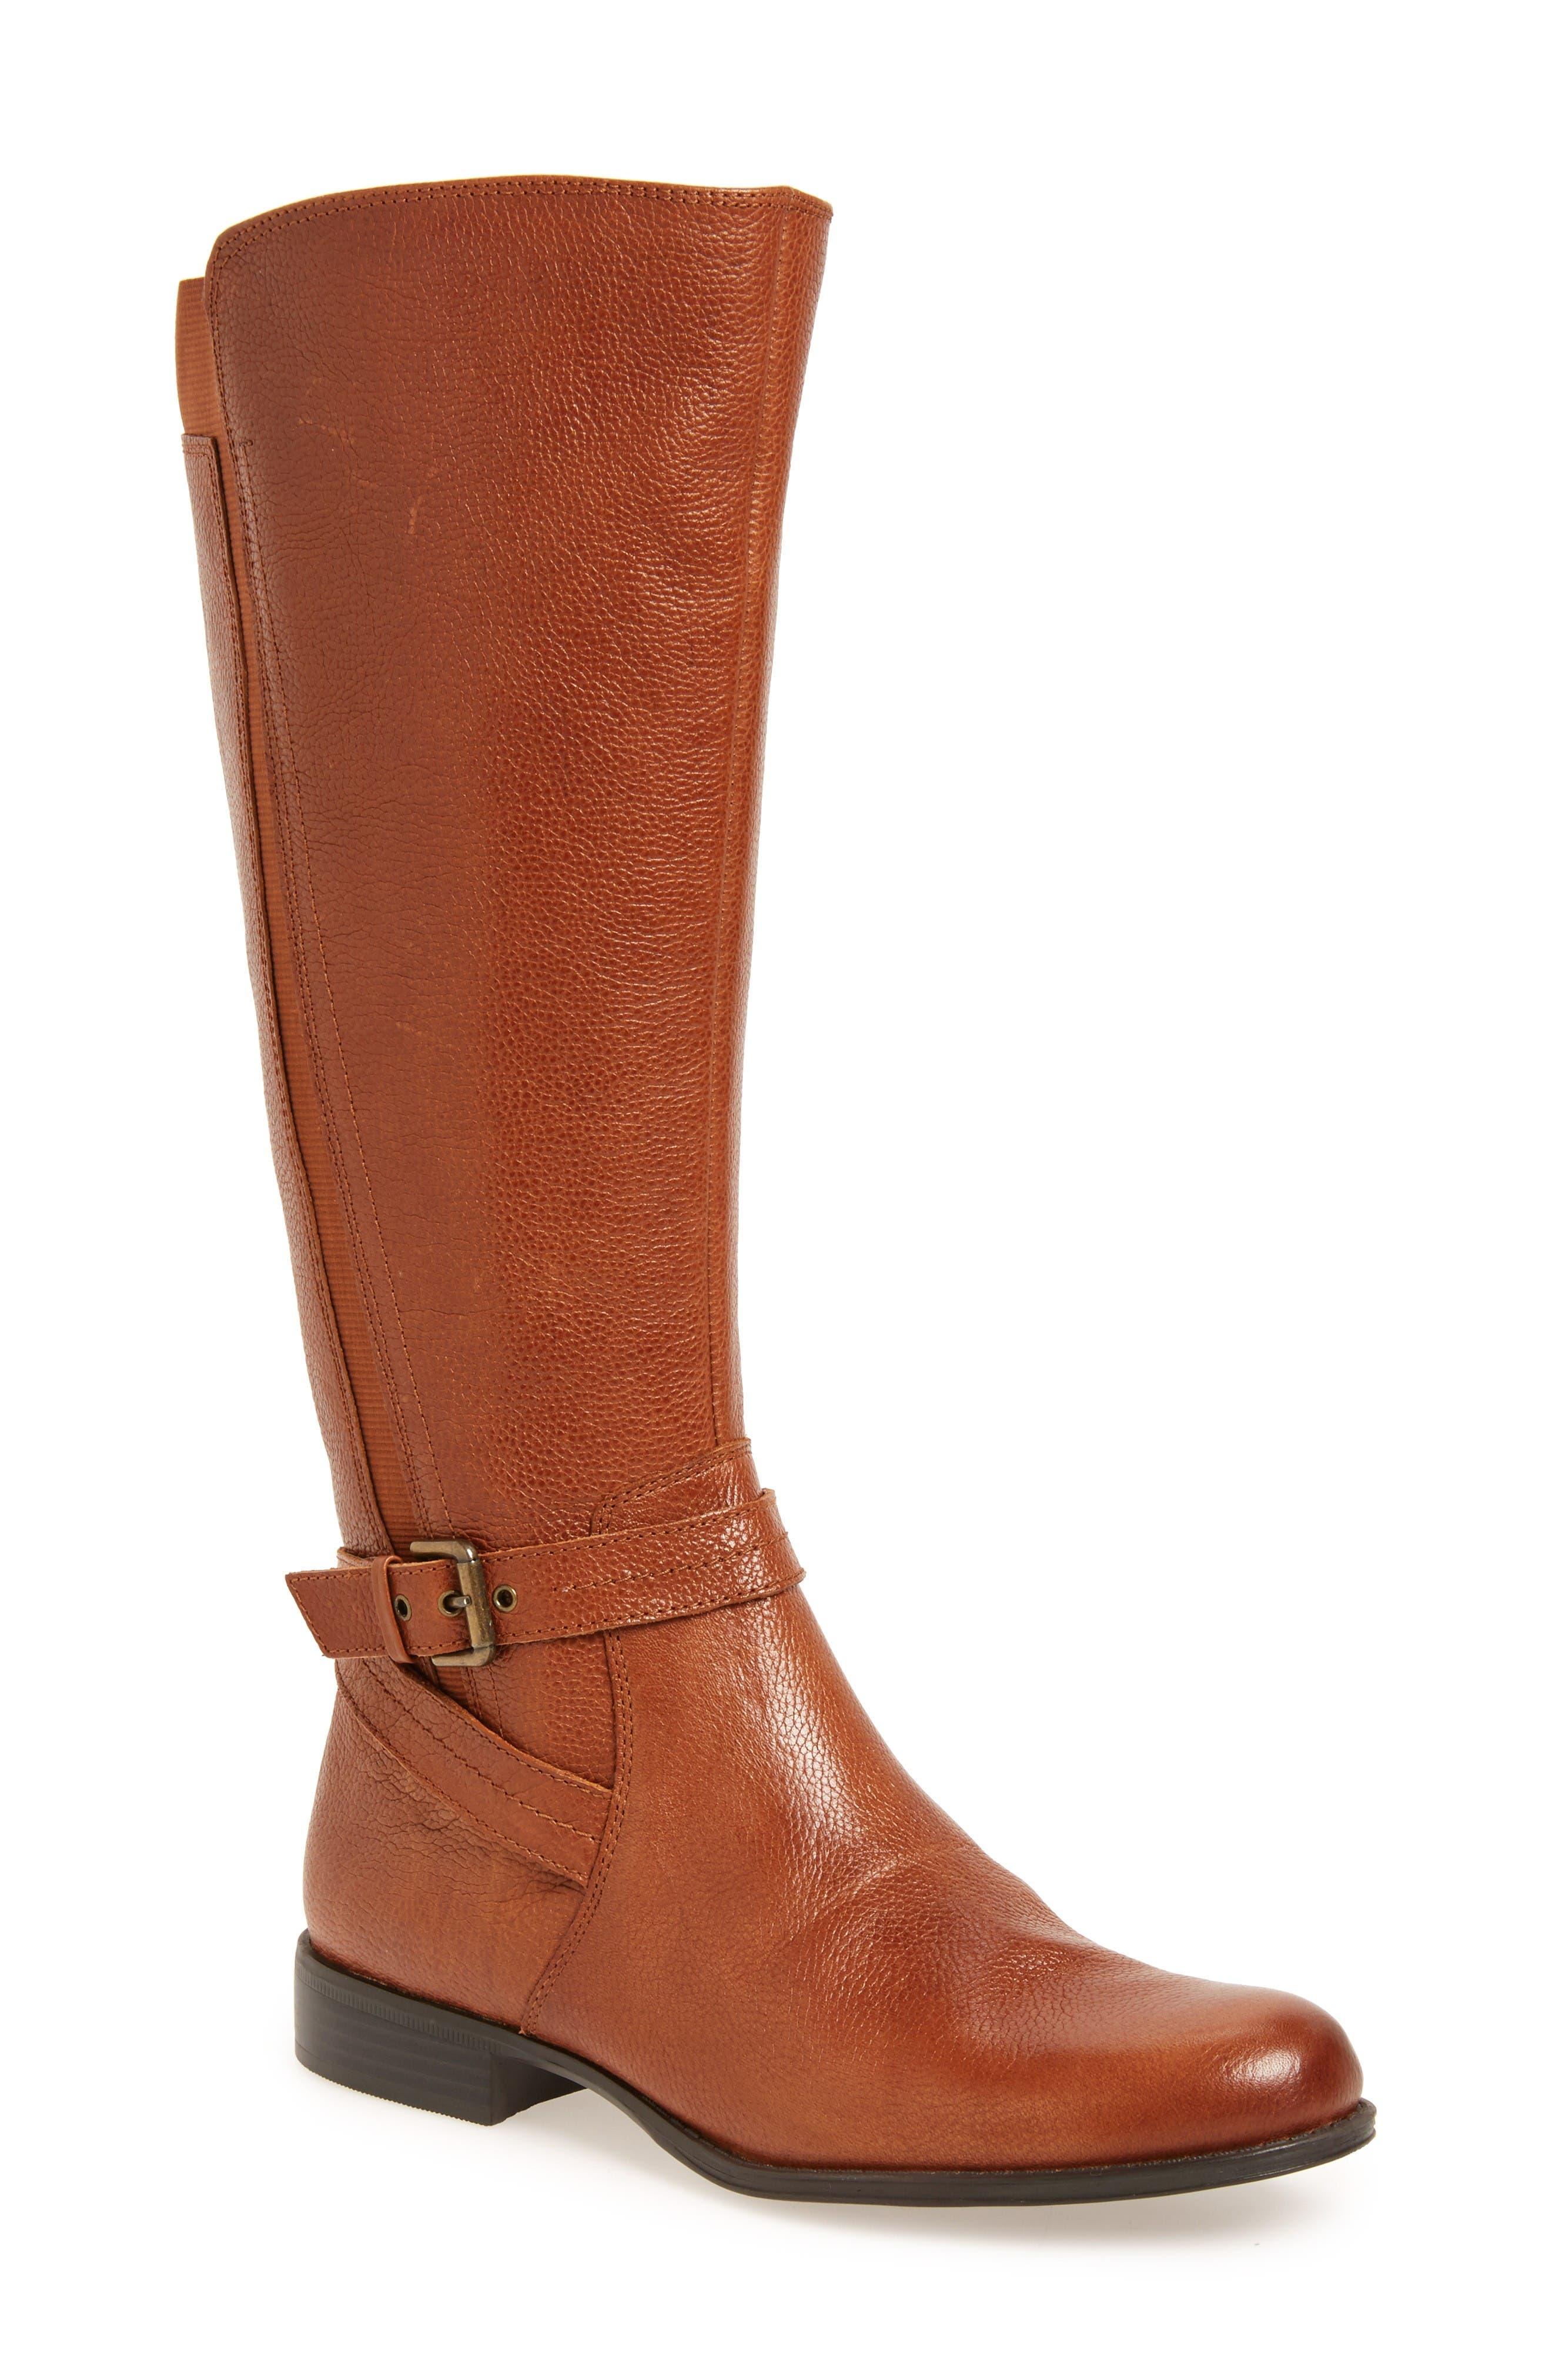 Alternate Image 1 Selected - Naturalizer 'Jelina' Riding Boot (Women)